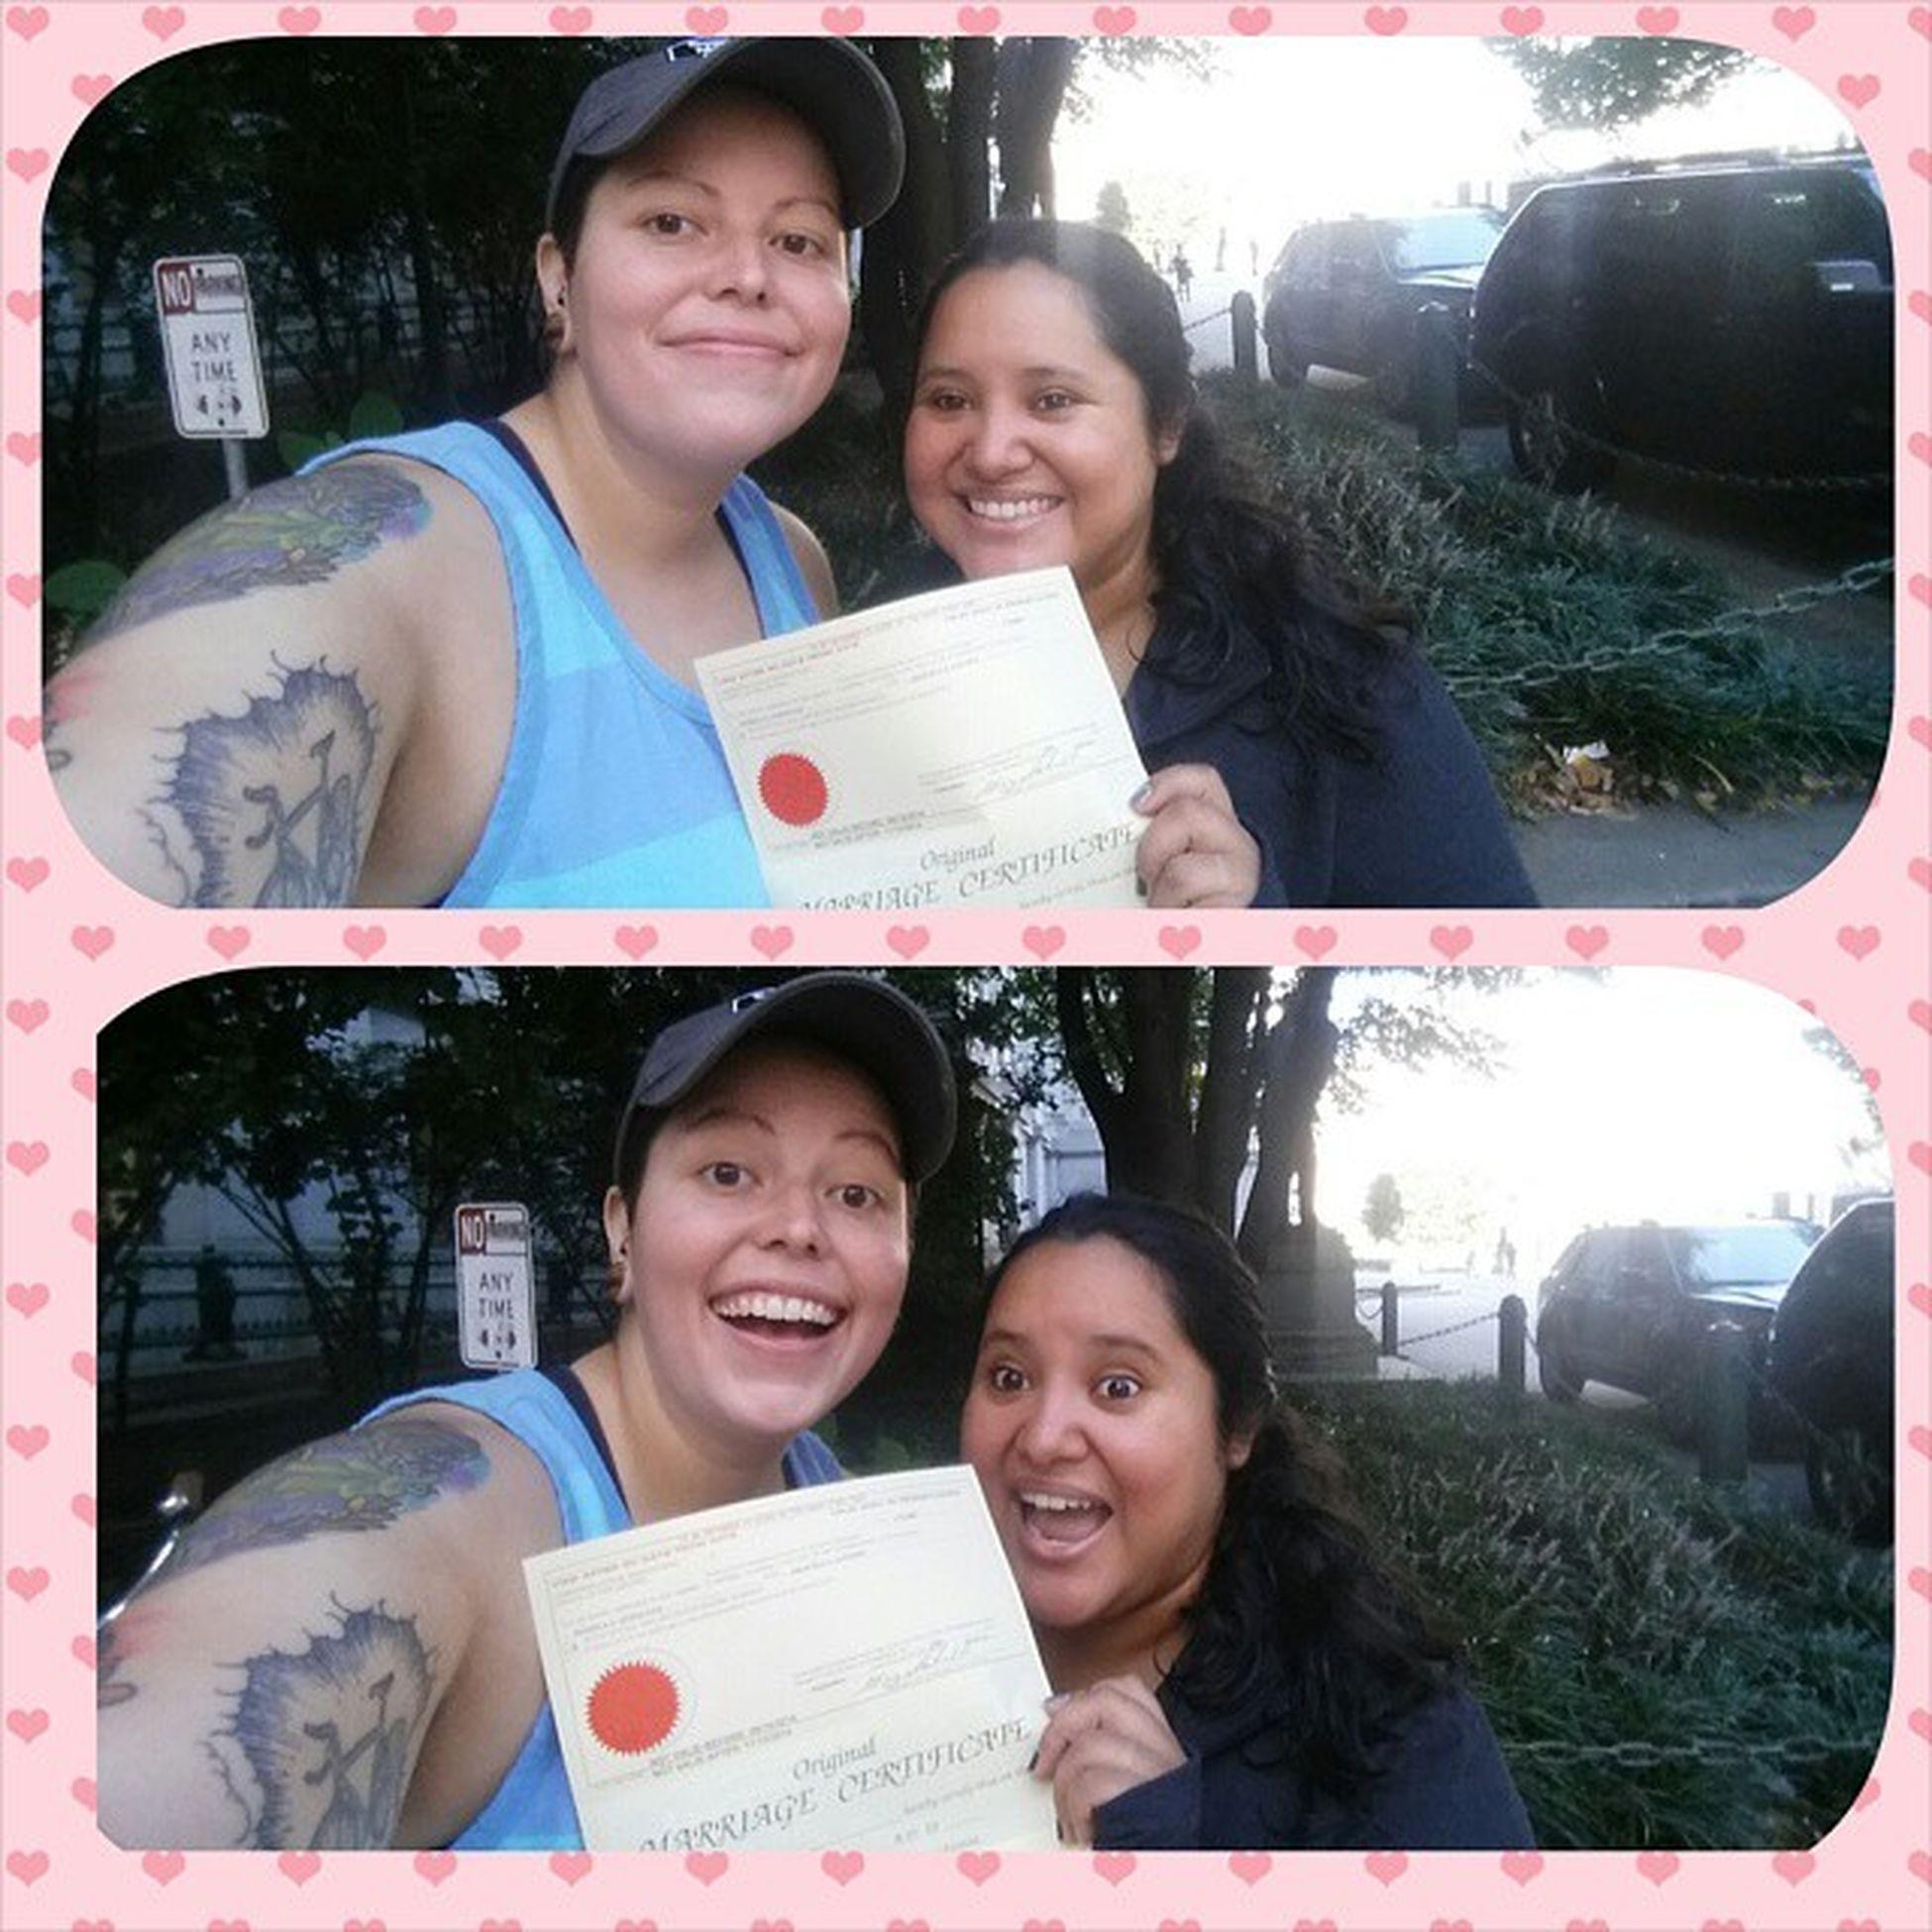 this just happened!! ???? Marriagelicenseday Gettingmarried 10414 Marryingmybestfriend loveofmylife myforever @phillynerd